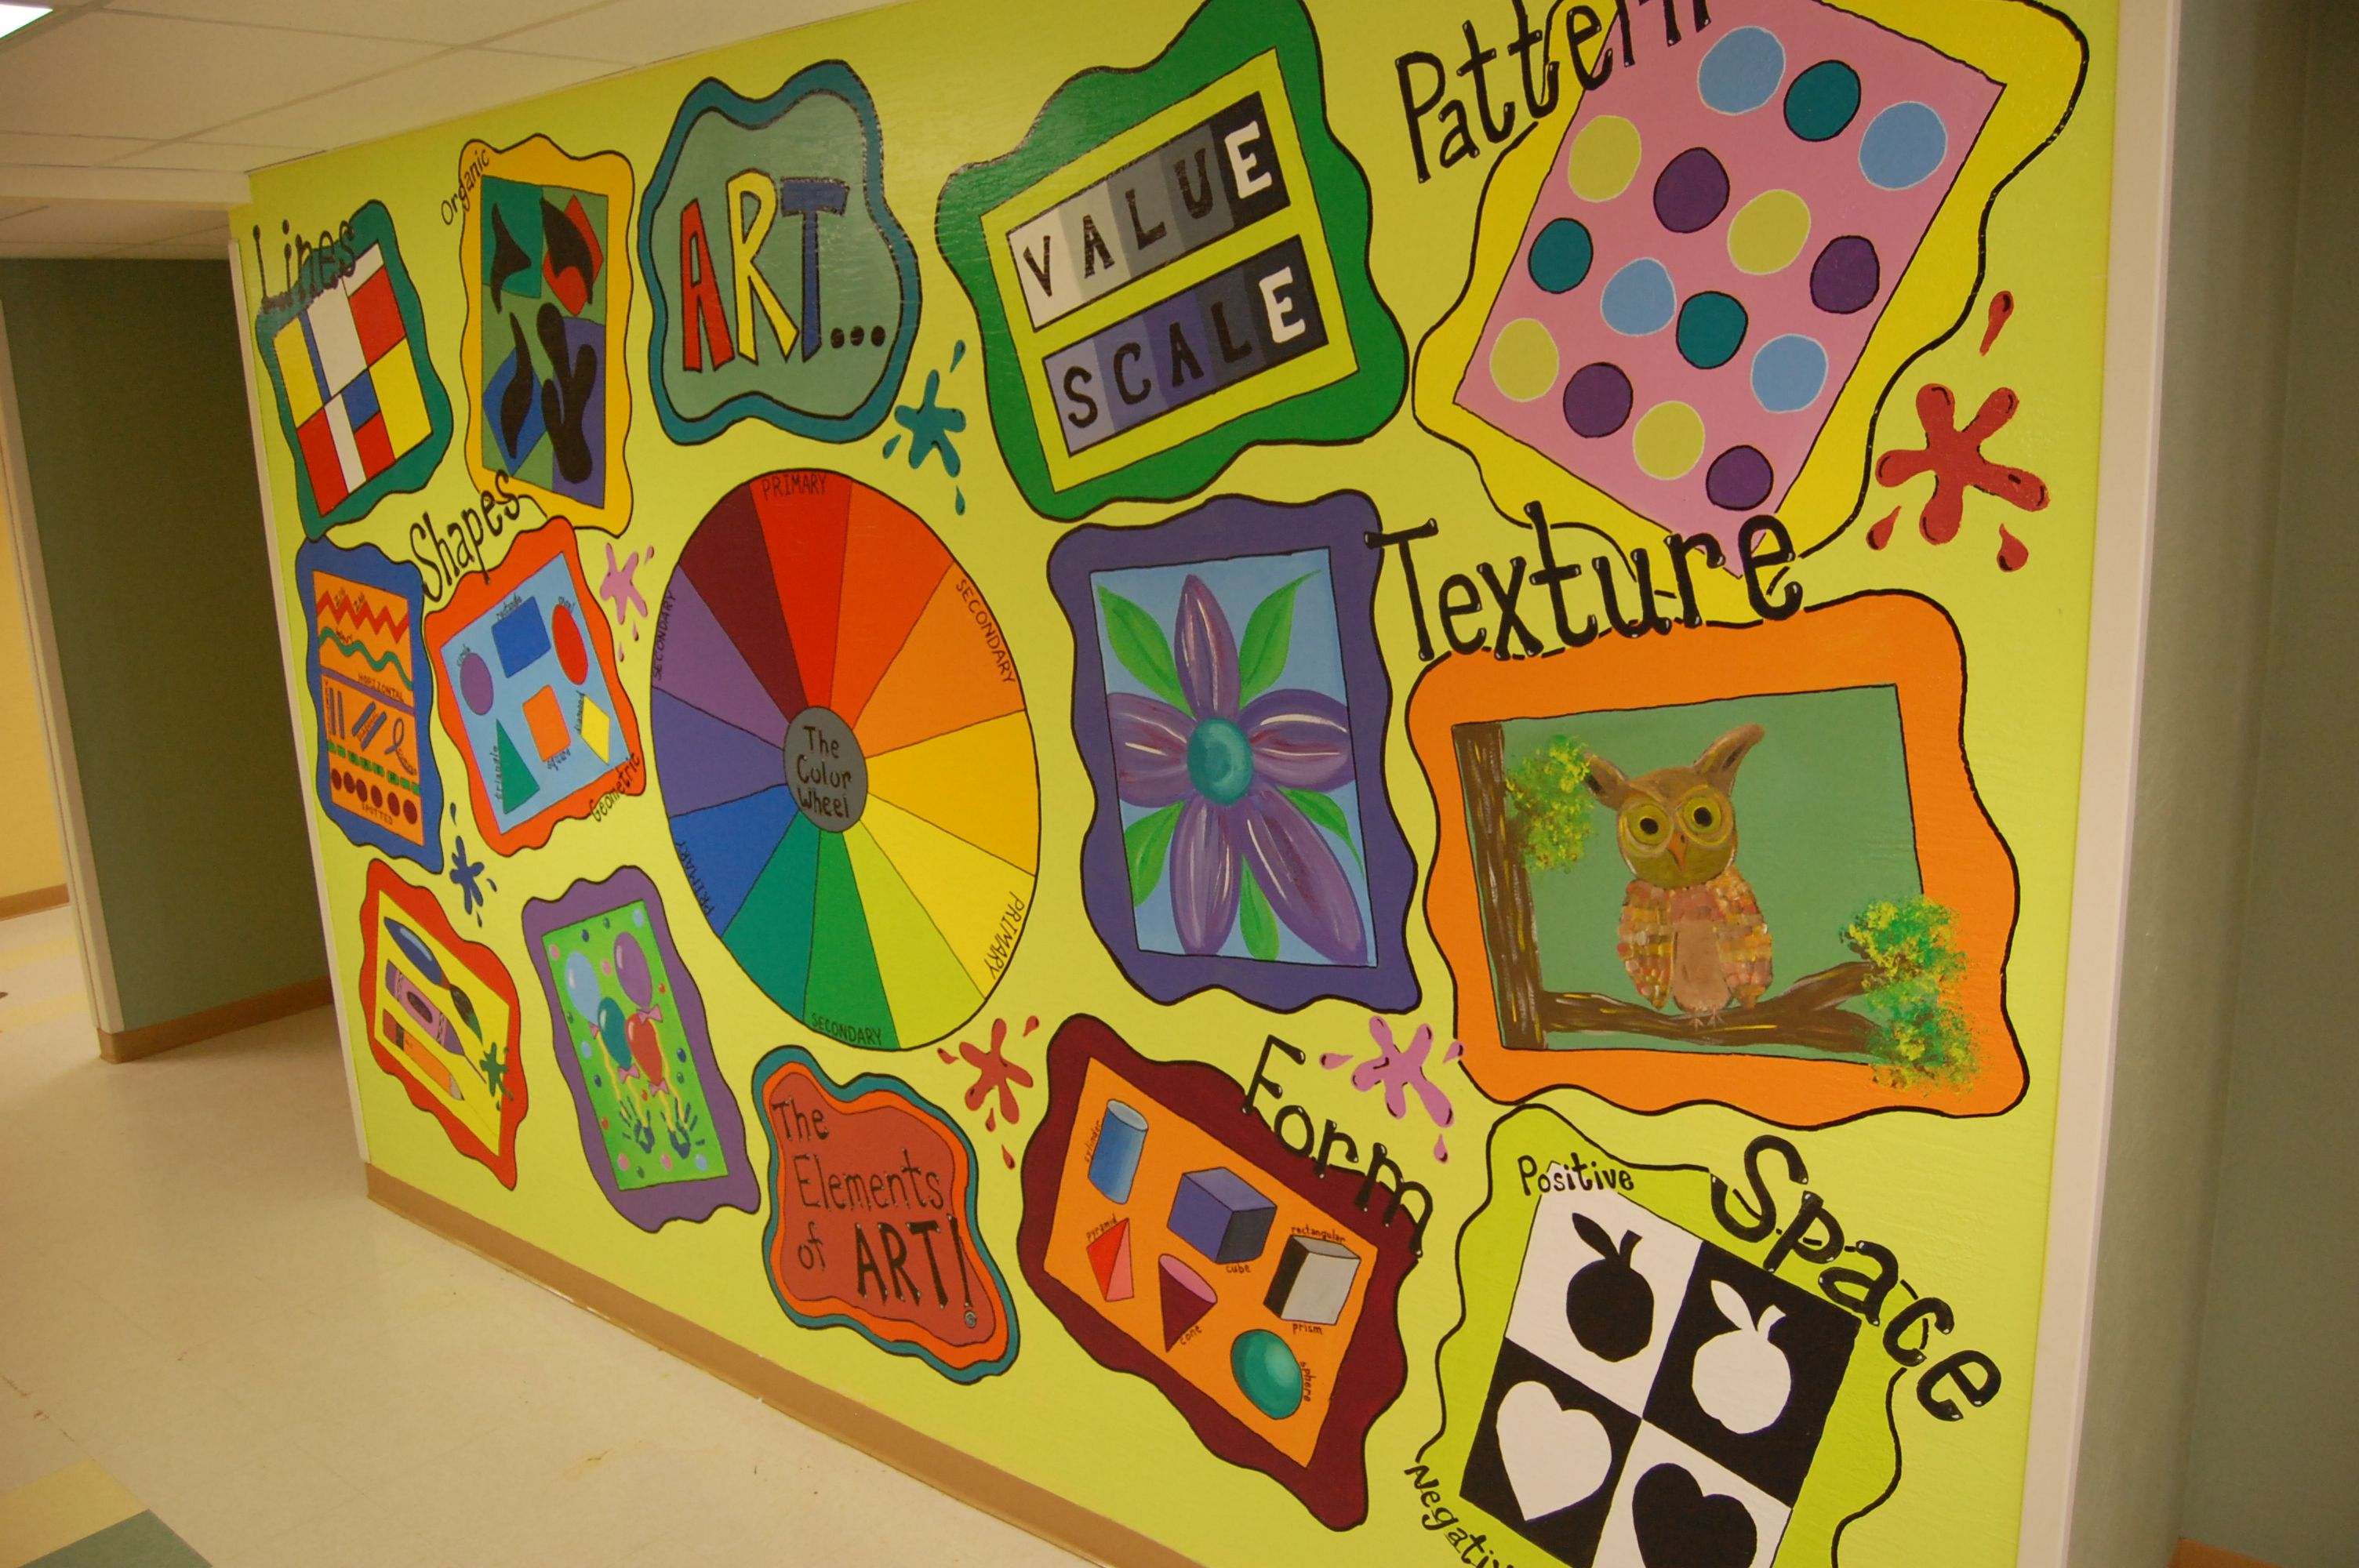 Arts And Elements : Art elements and principles mural